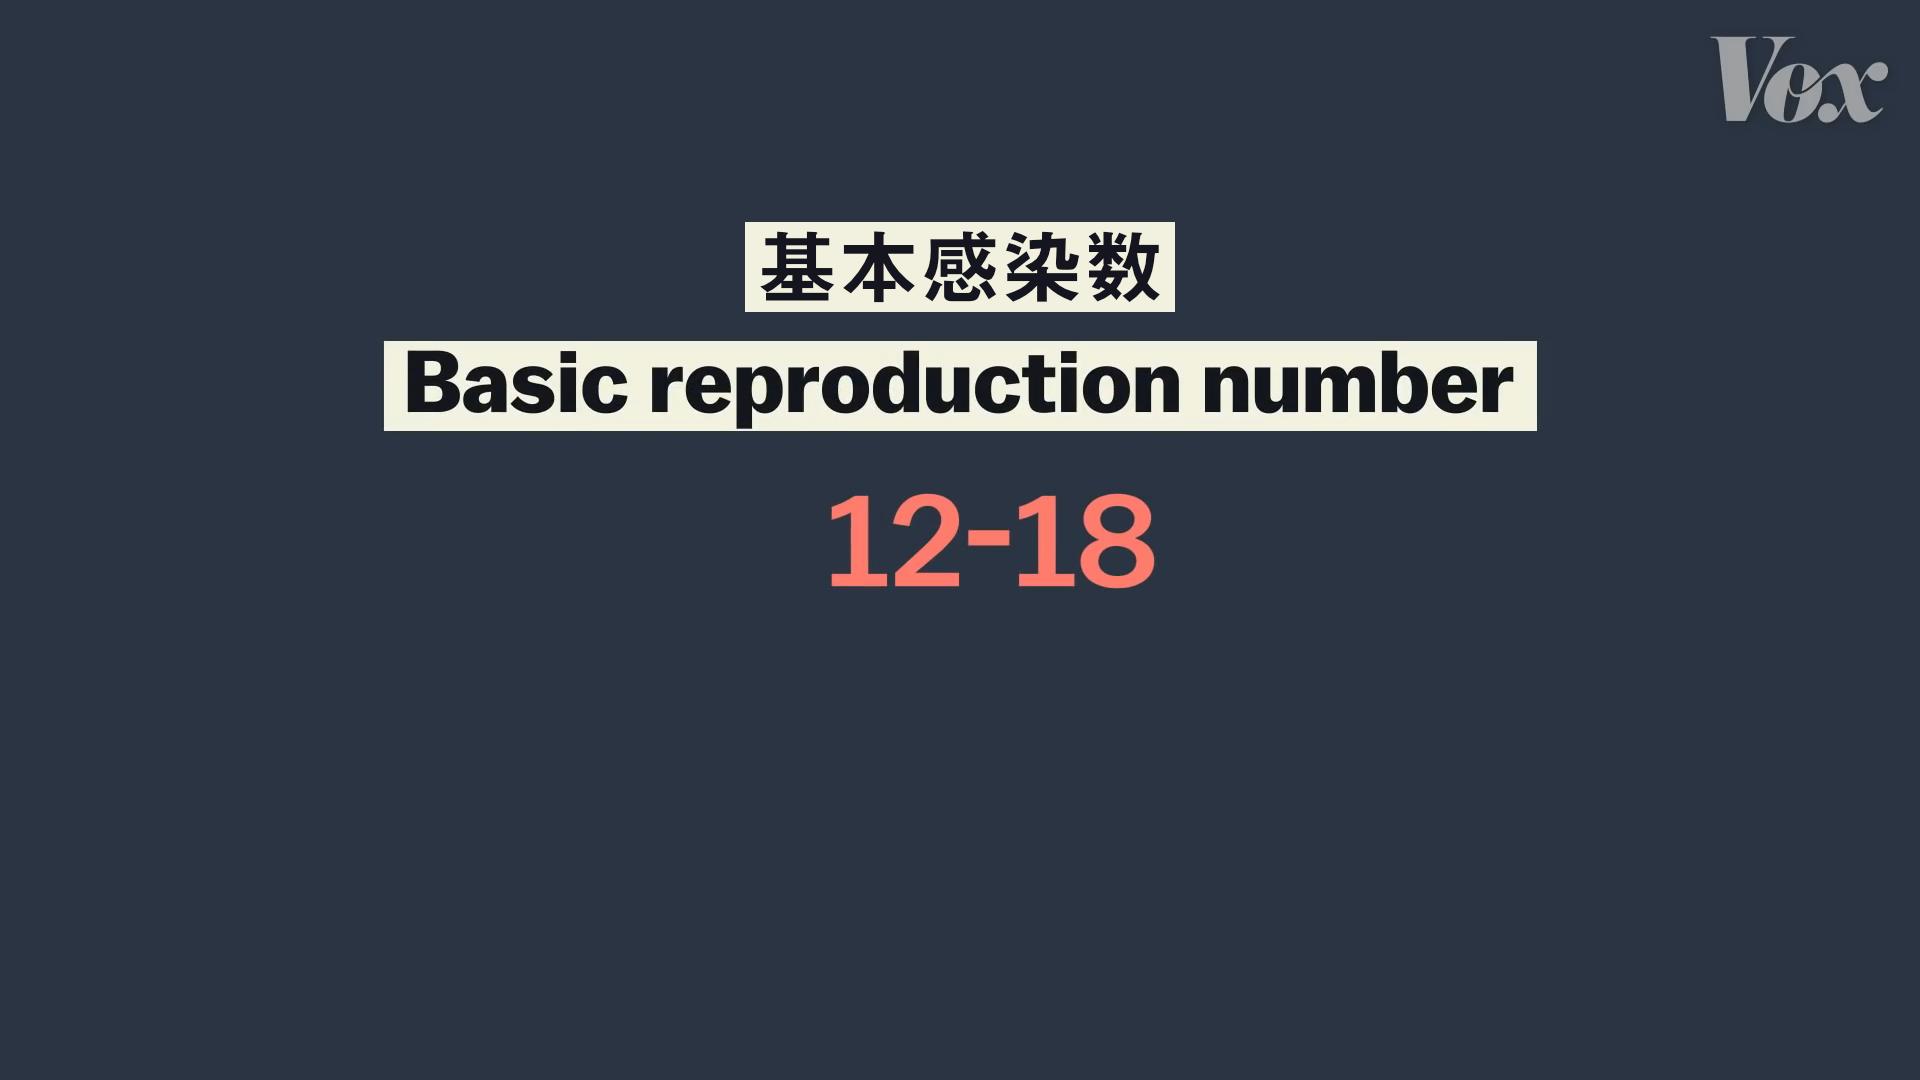 f:id:Imamura:20200408133018p:plain